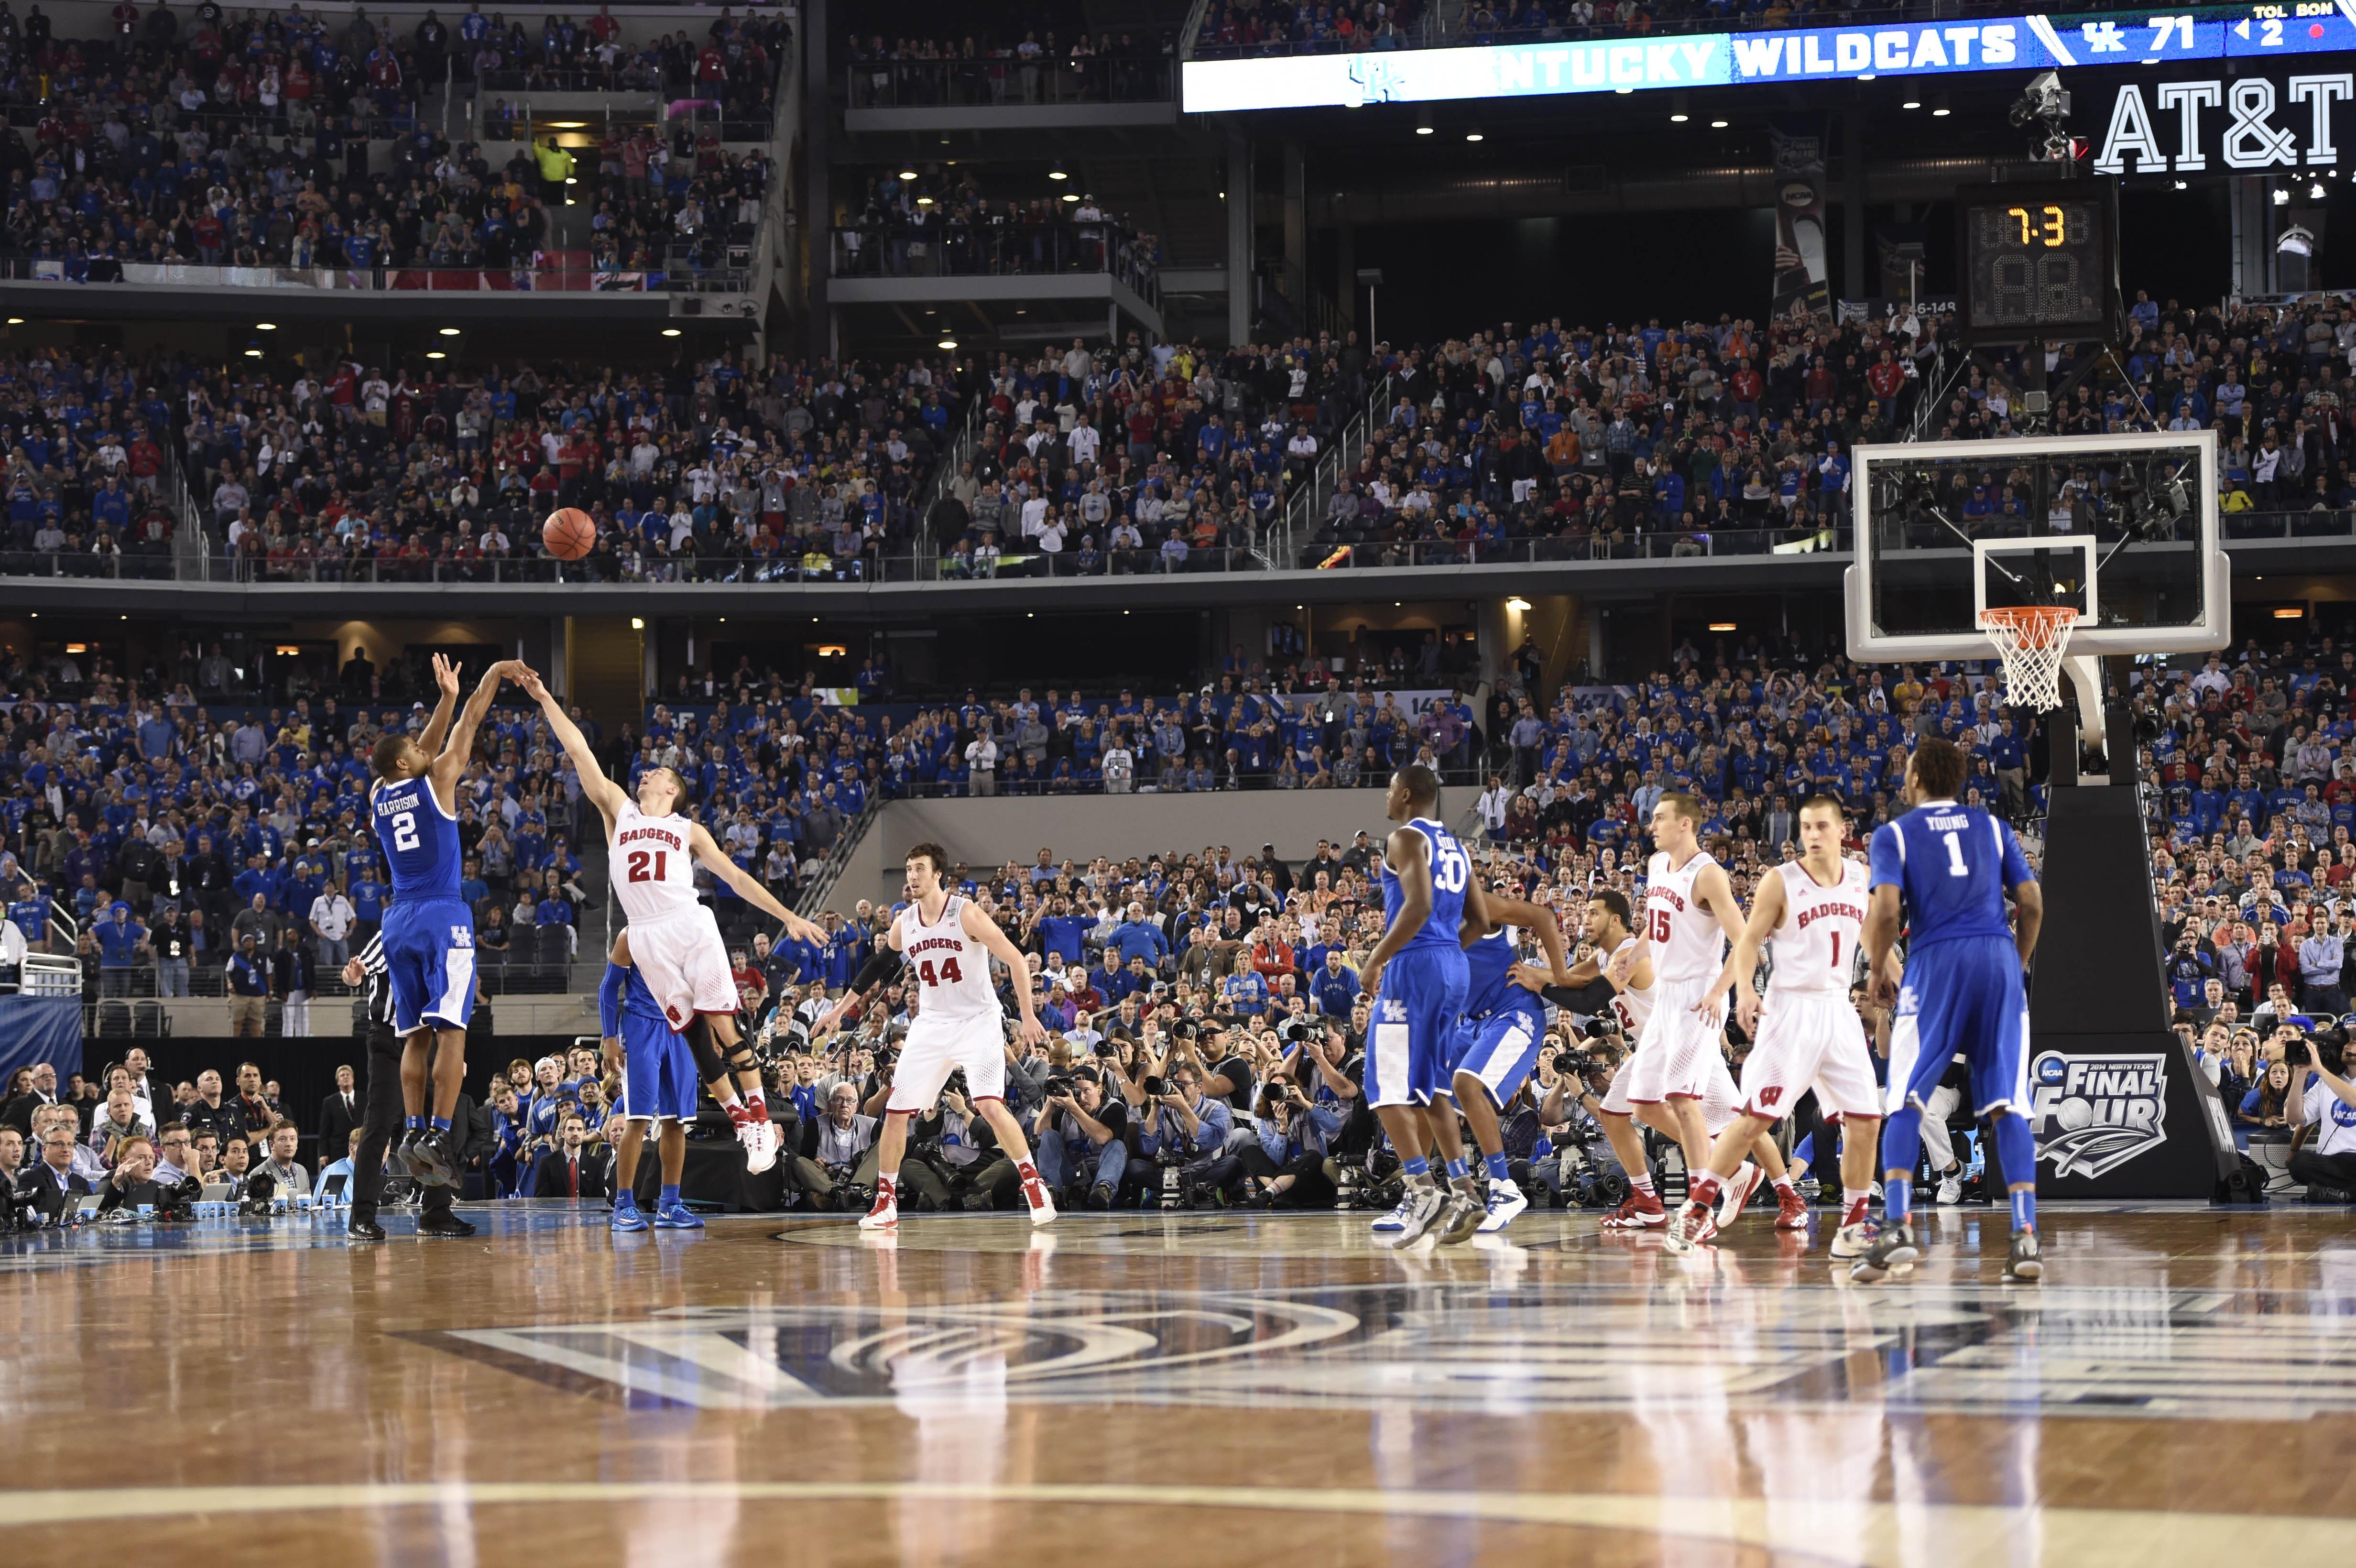 7854982-ncaa-basketball-final-four-wisconsin-vs-kentucky